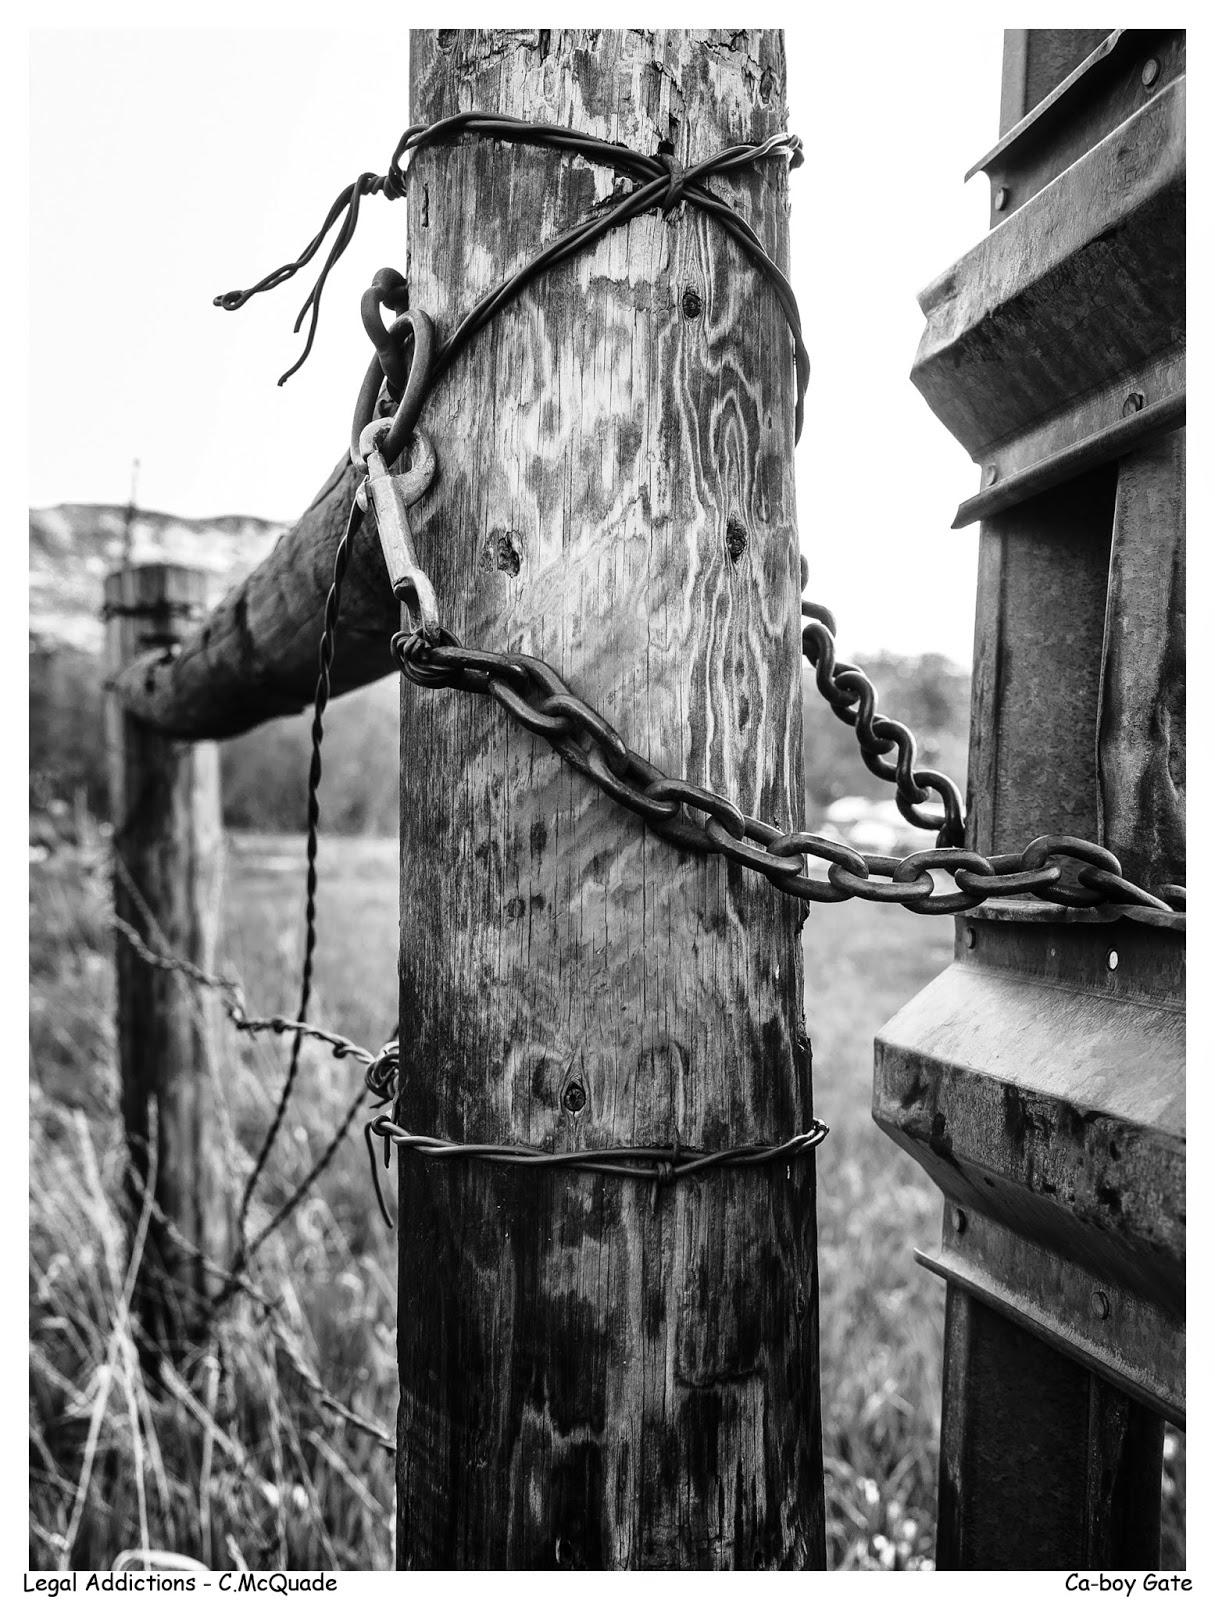 fence-20142652.jpg